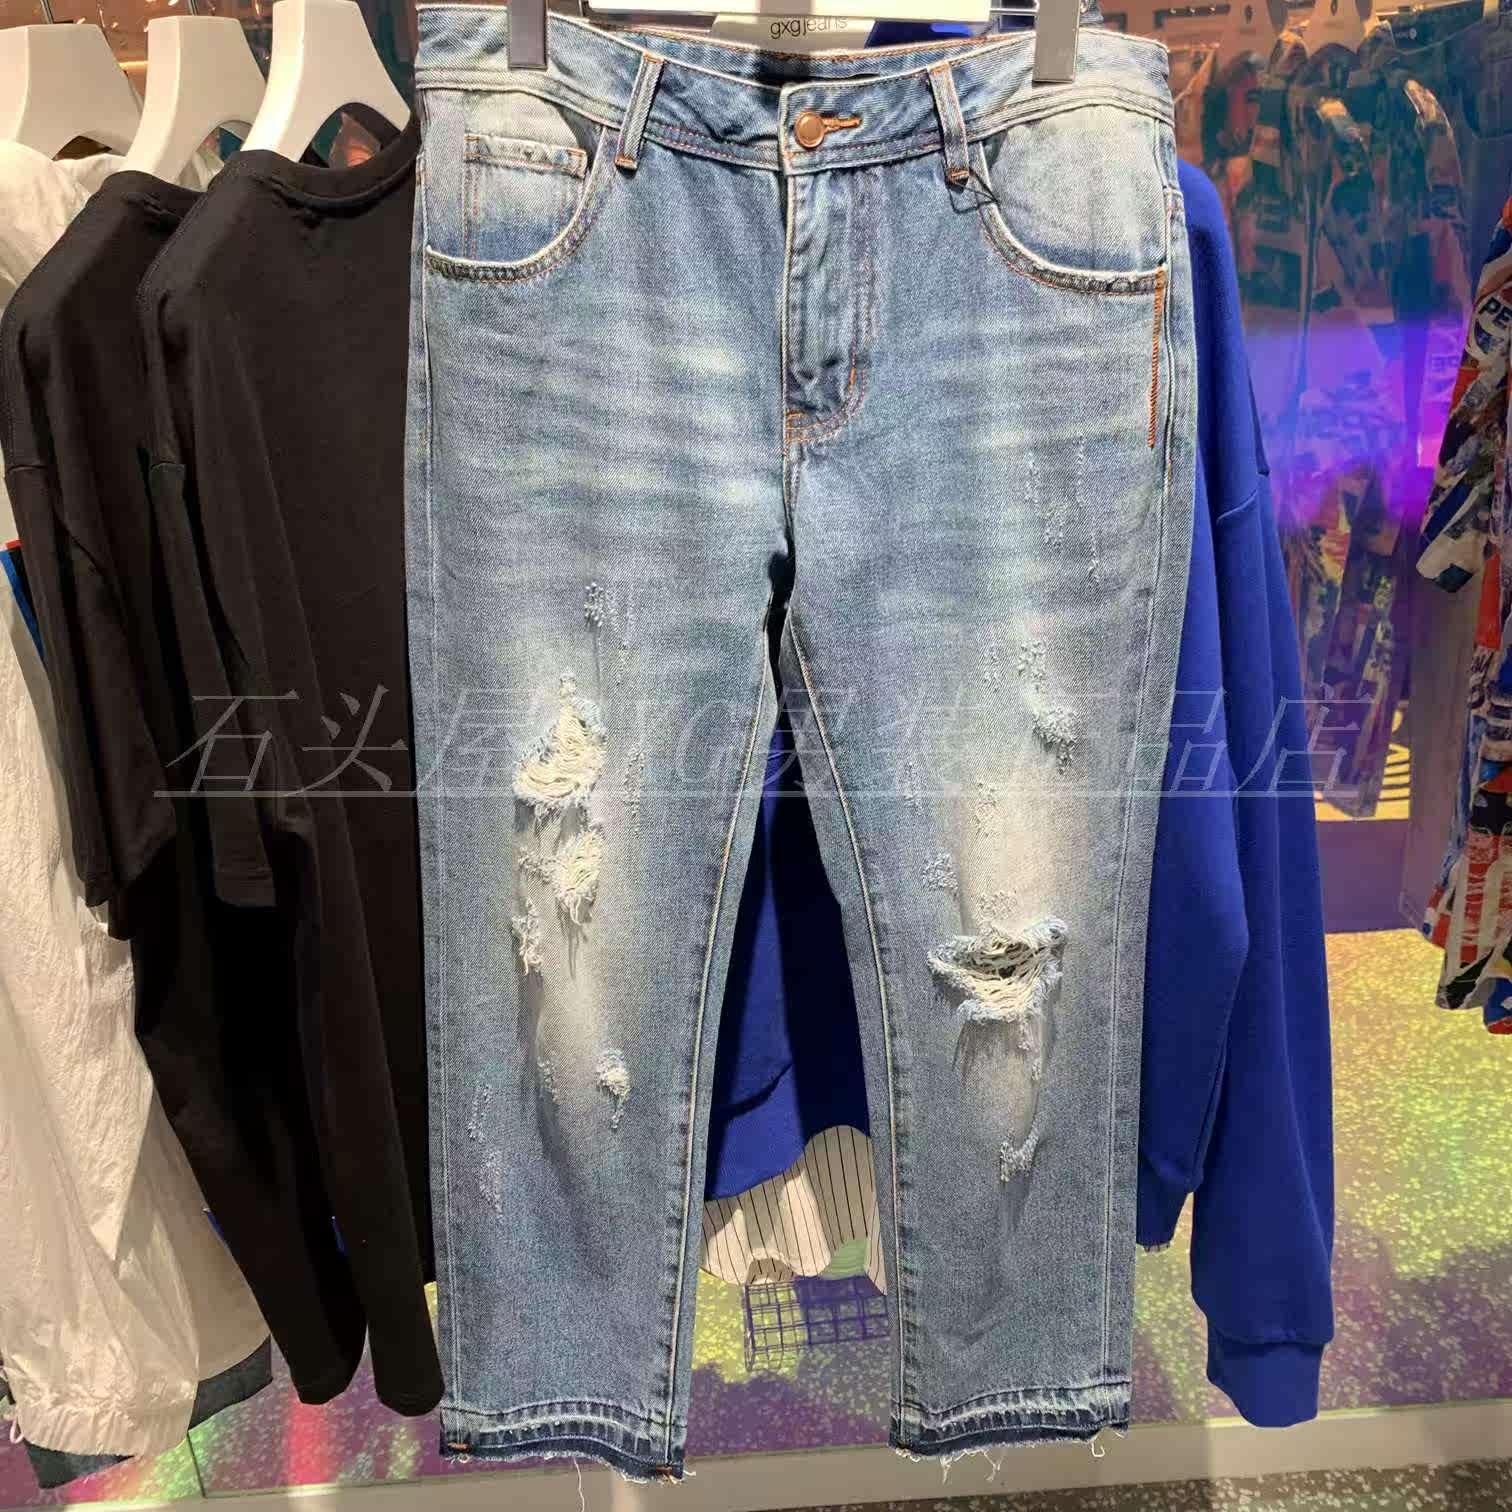 gxg jeans男装2019夏季新款 蓝色修身破洞牛仔裤九分裤JY105058A